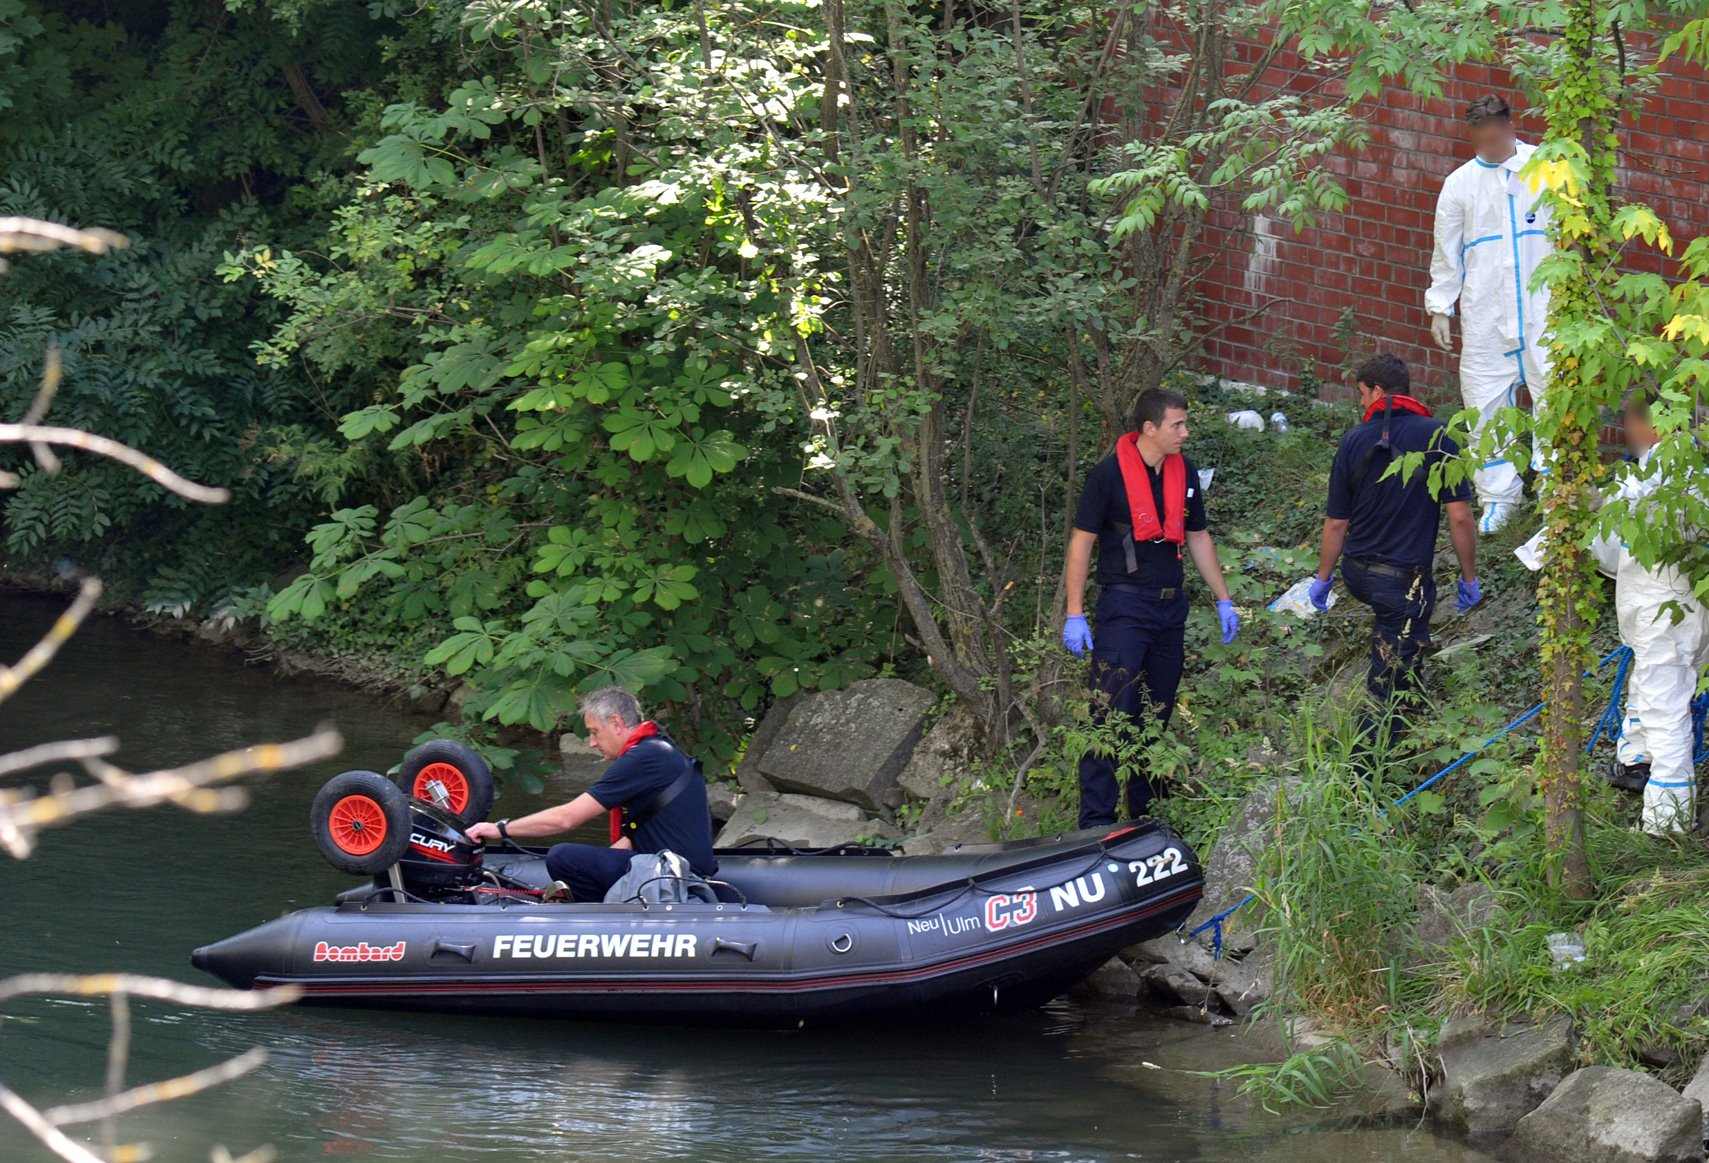 24-07-2012 neu-ulm wasserleiche donau heckmann new-facts-eu